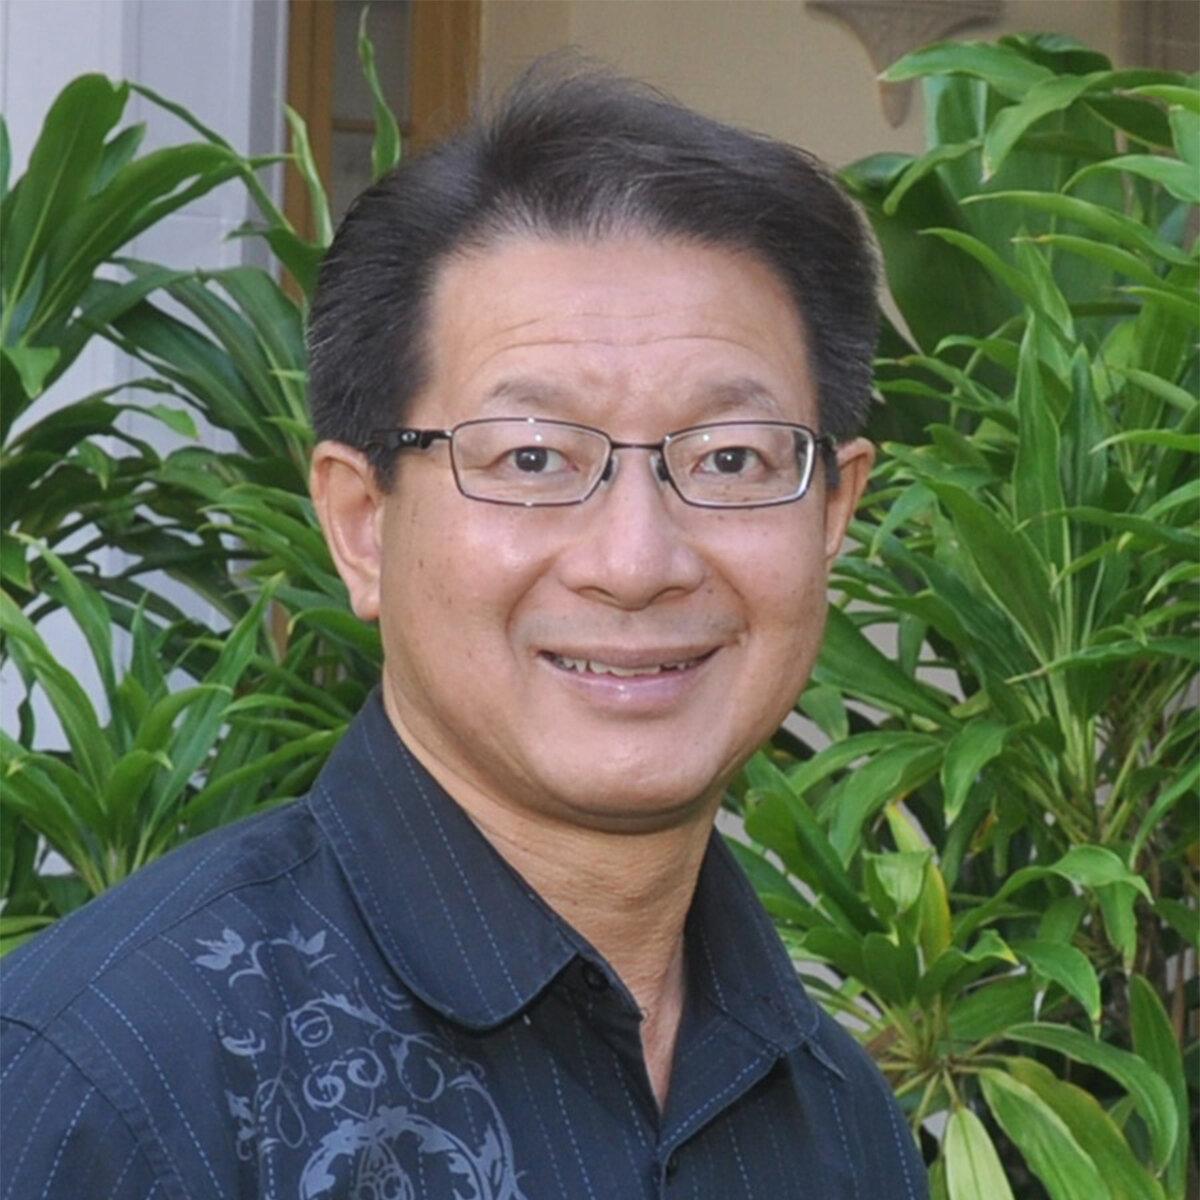 Terry Wong, Hawaii